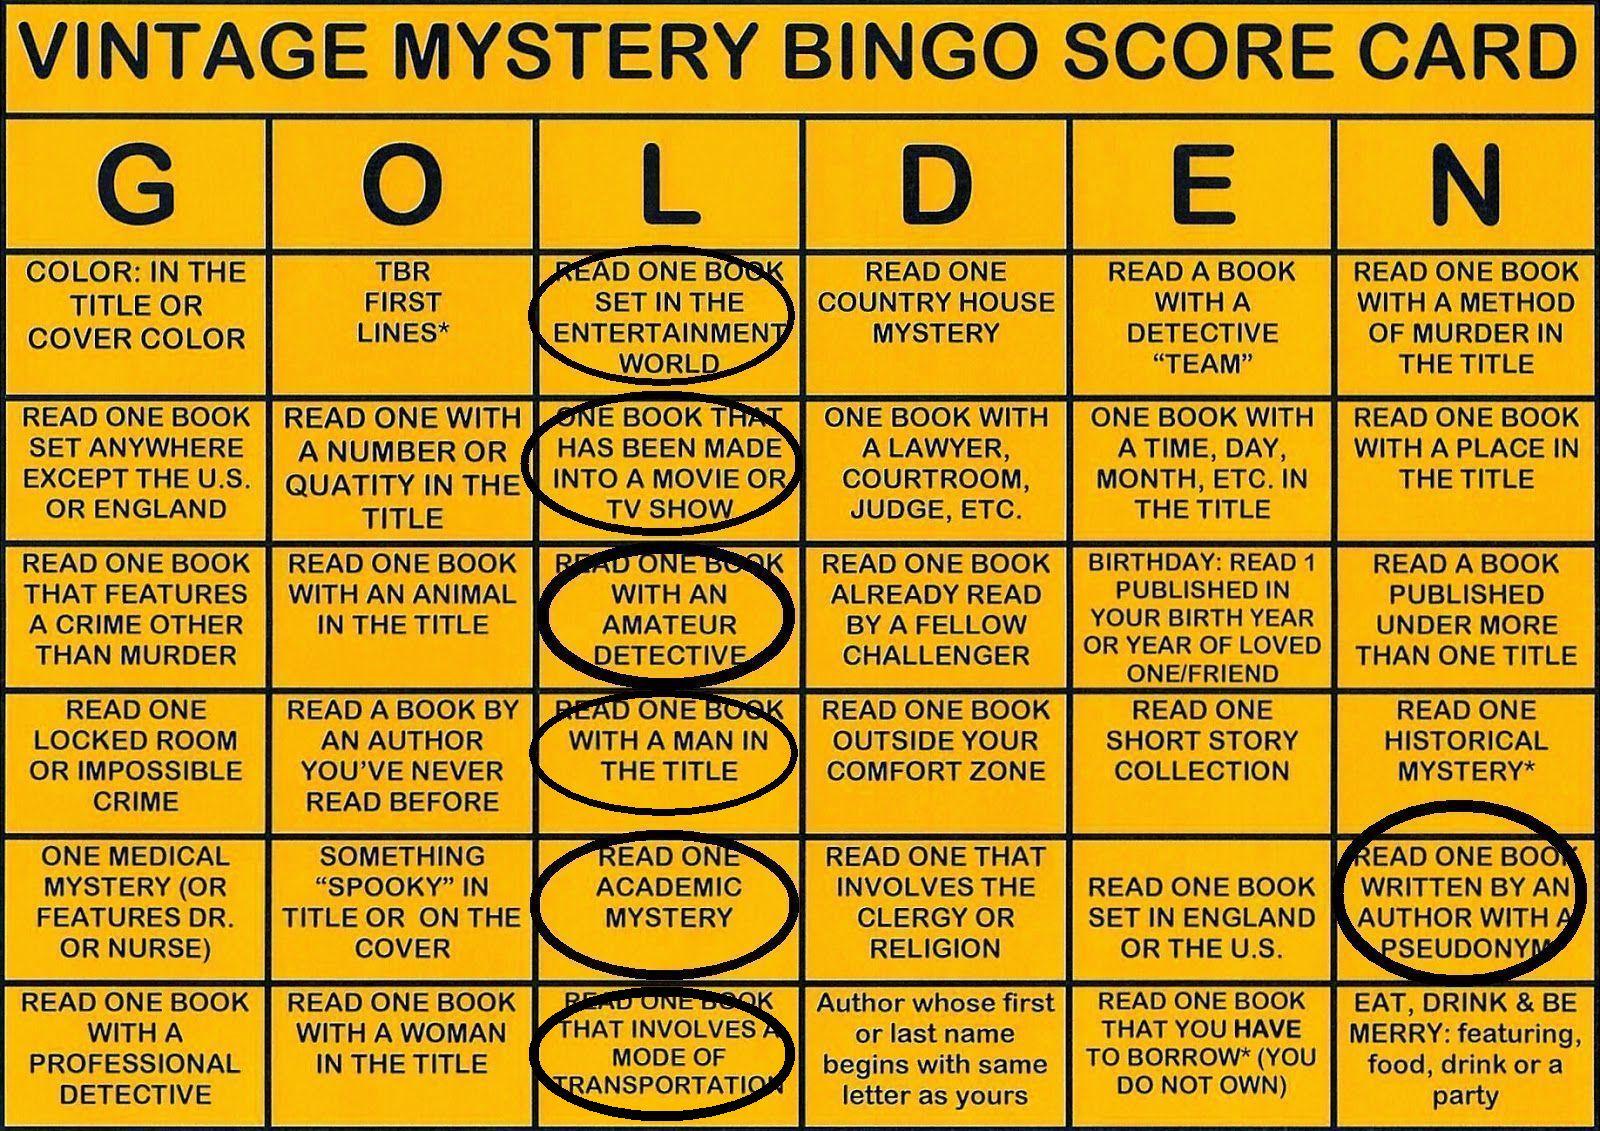 Vintage Golden Bingo Card 2015 to date